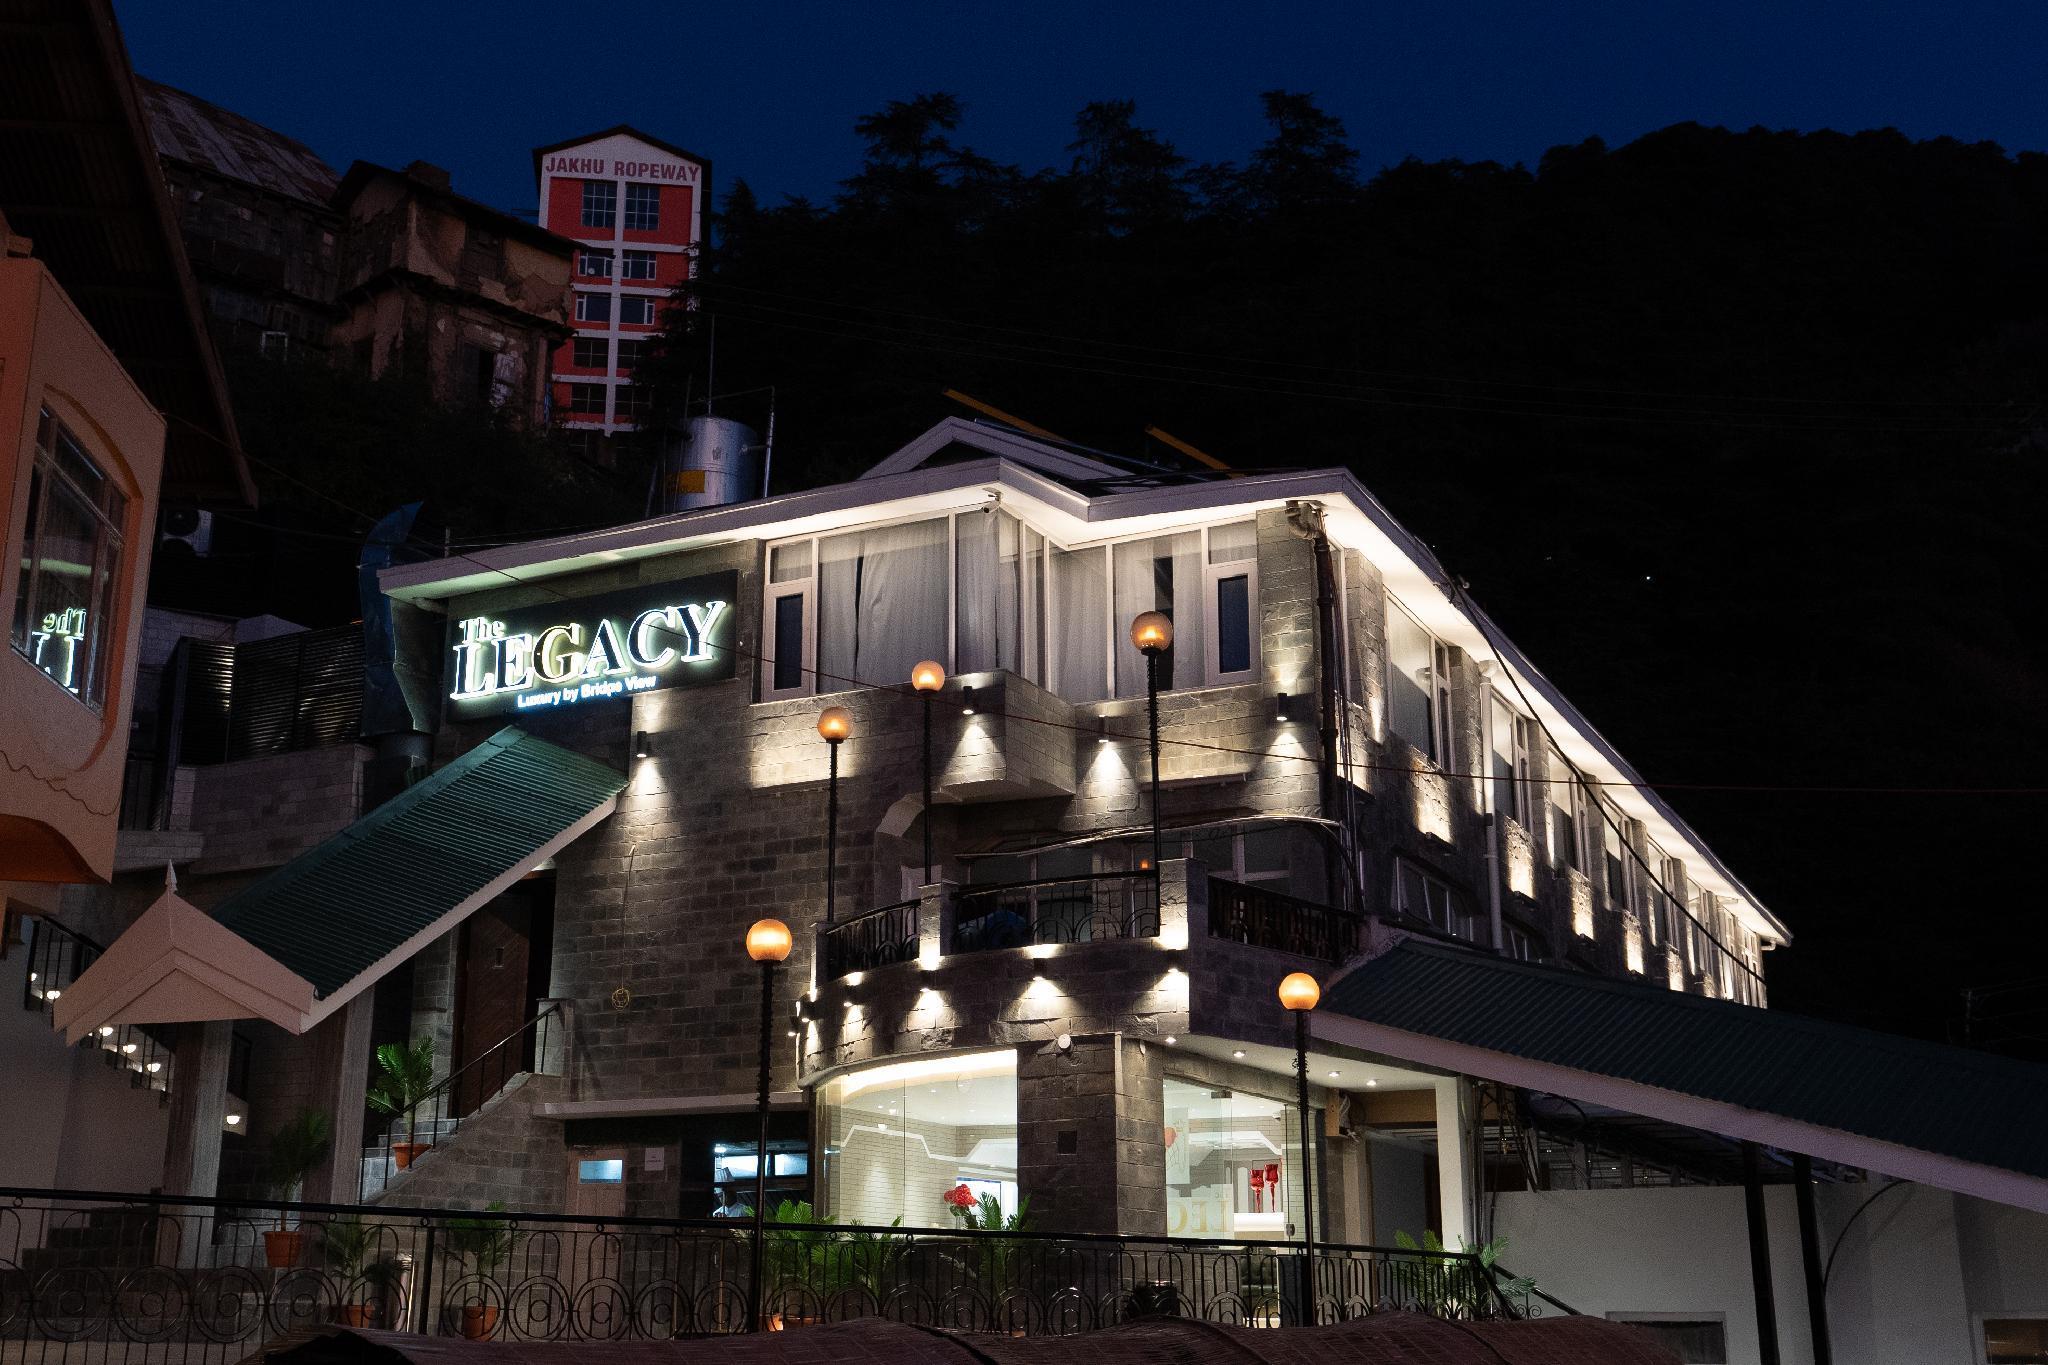 HOTEL THE LEGACY SHIMLA